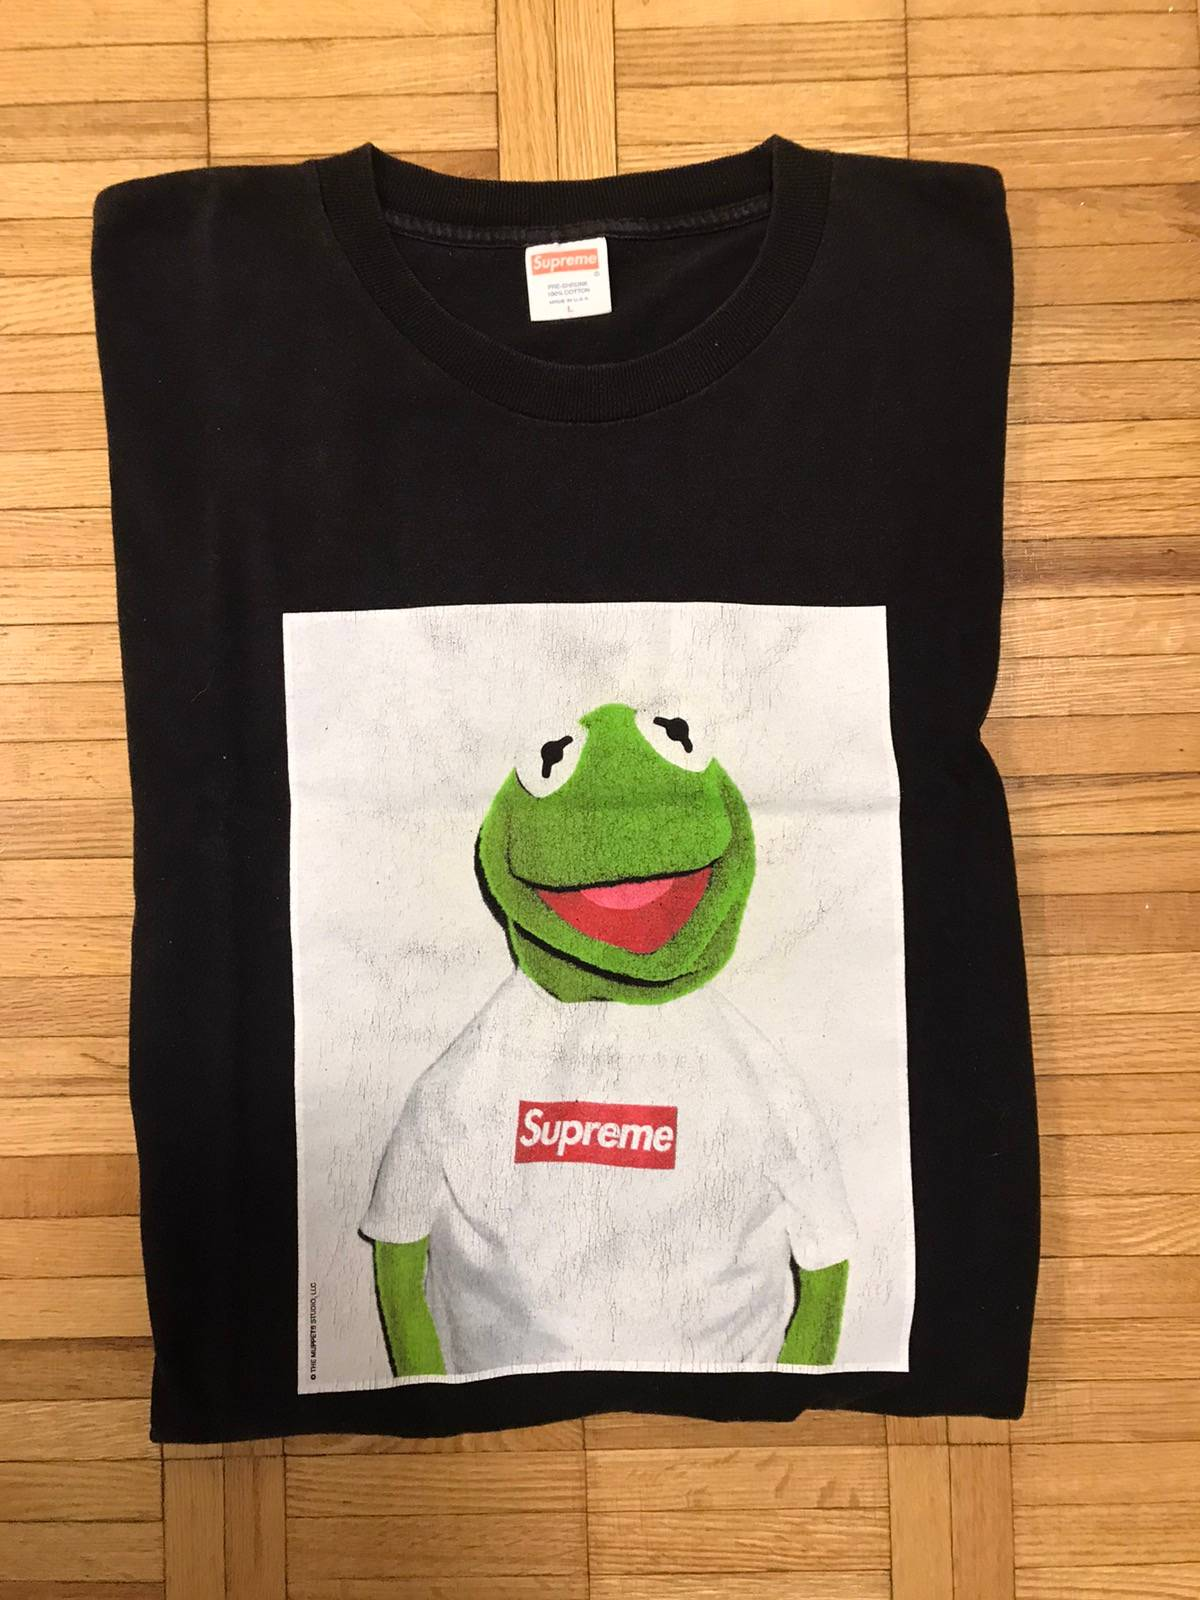 Supreme Supreme Kermit Tee Shirt!🔥🔥 | Grailed